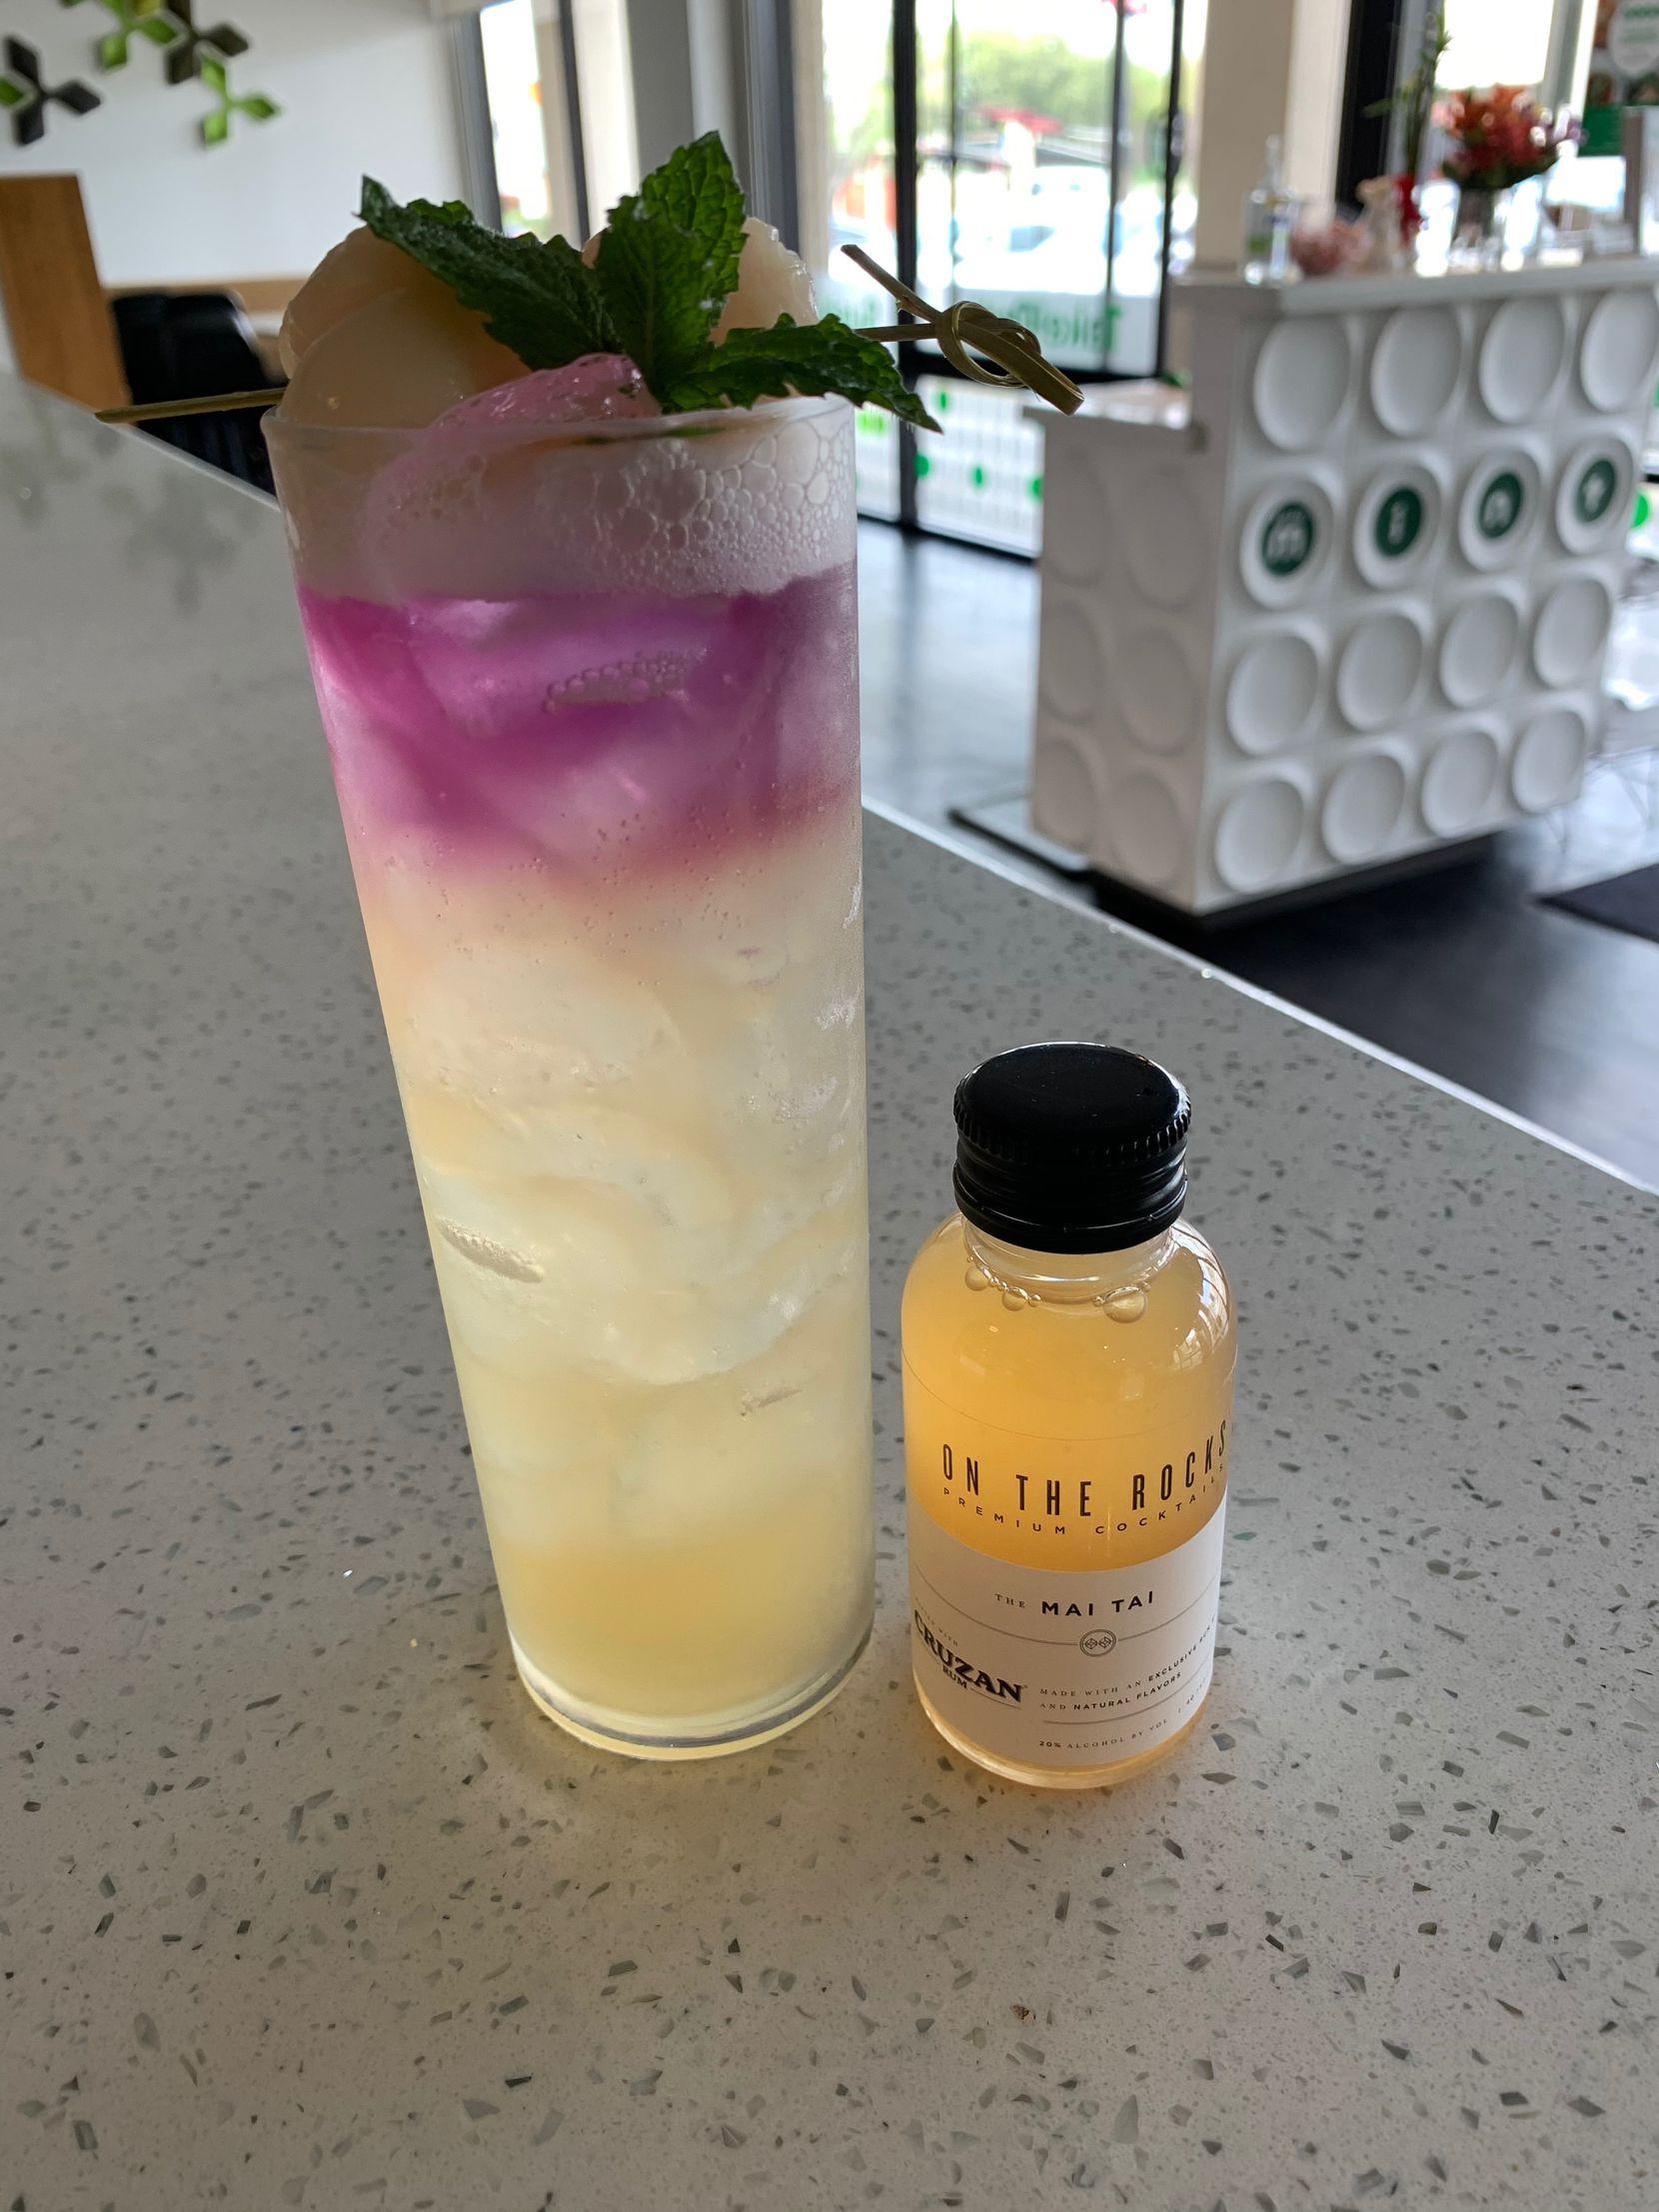 Mai Tai cocktail kit from Asian Mint restaurant